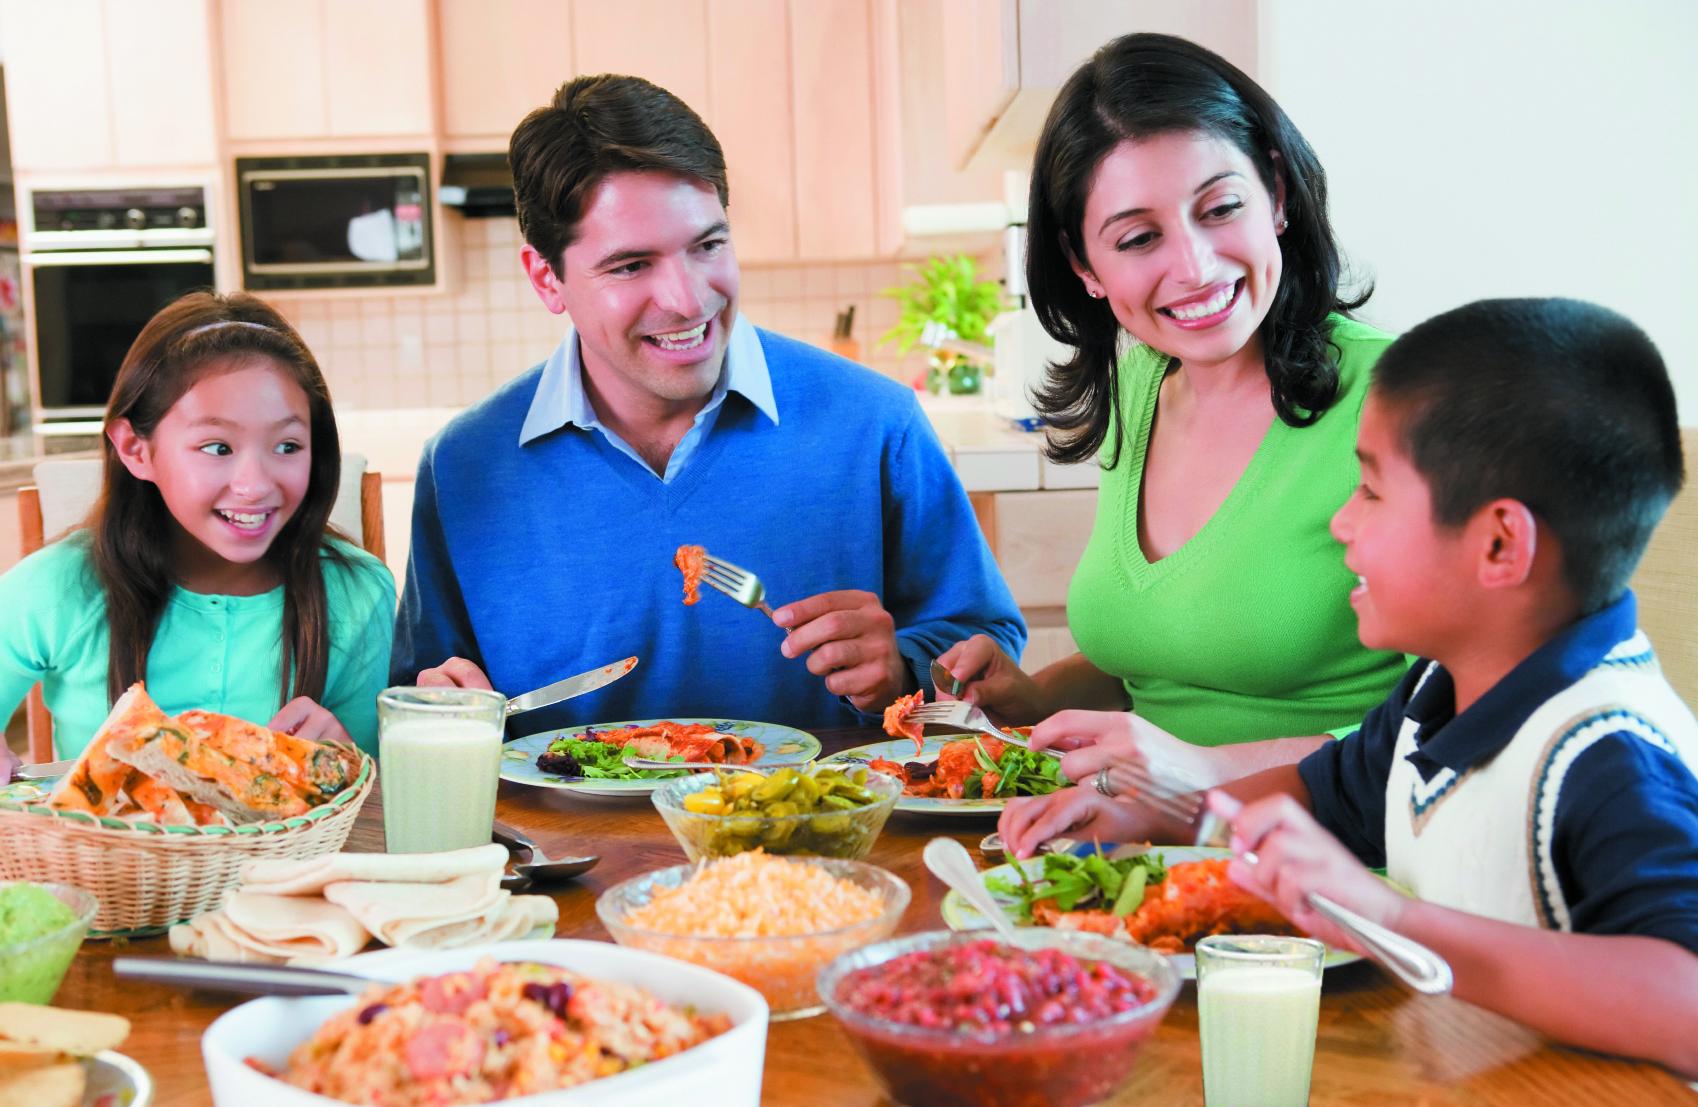 Family Enjoying Mealmealtime Together